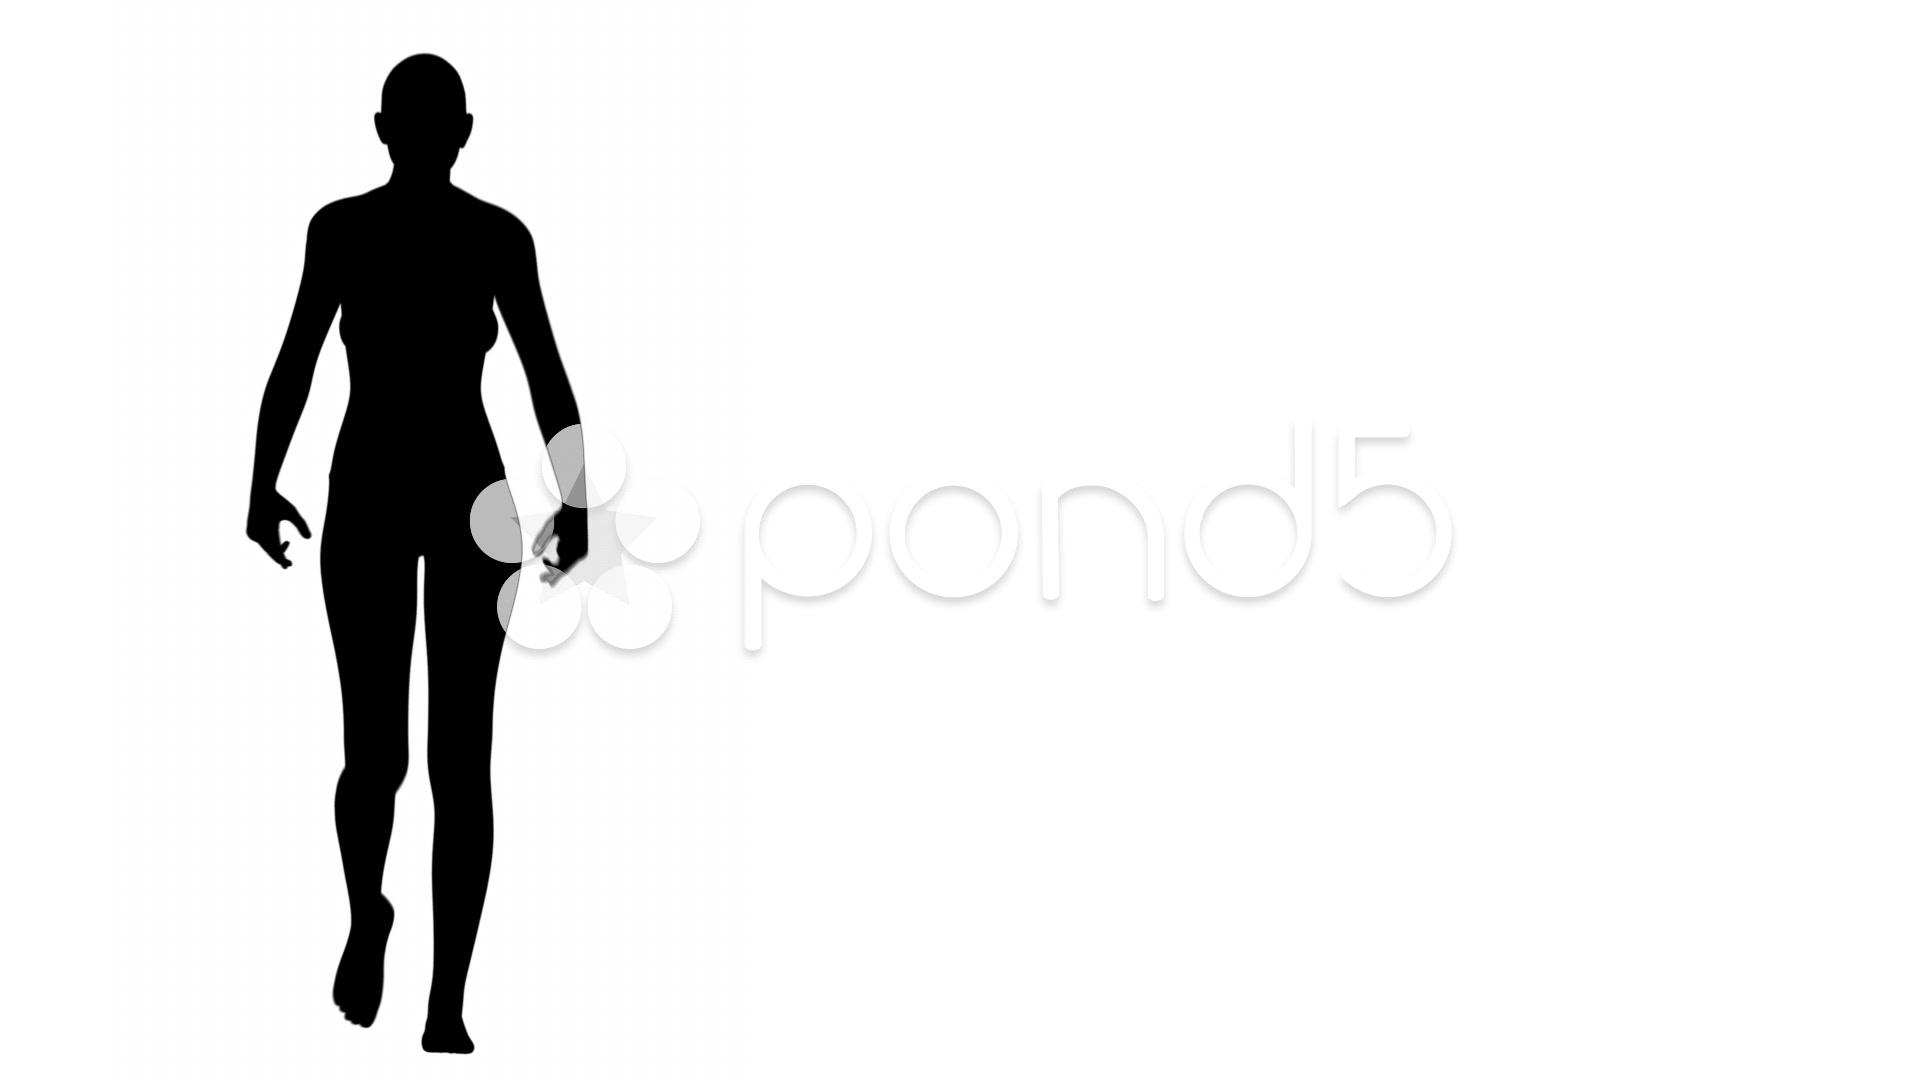 1920x1080 Silhouette Of A Woman Walking